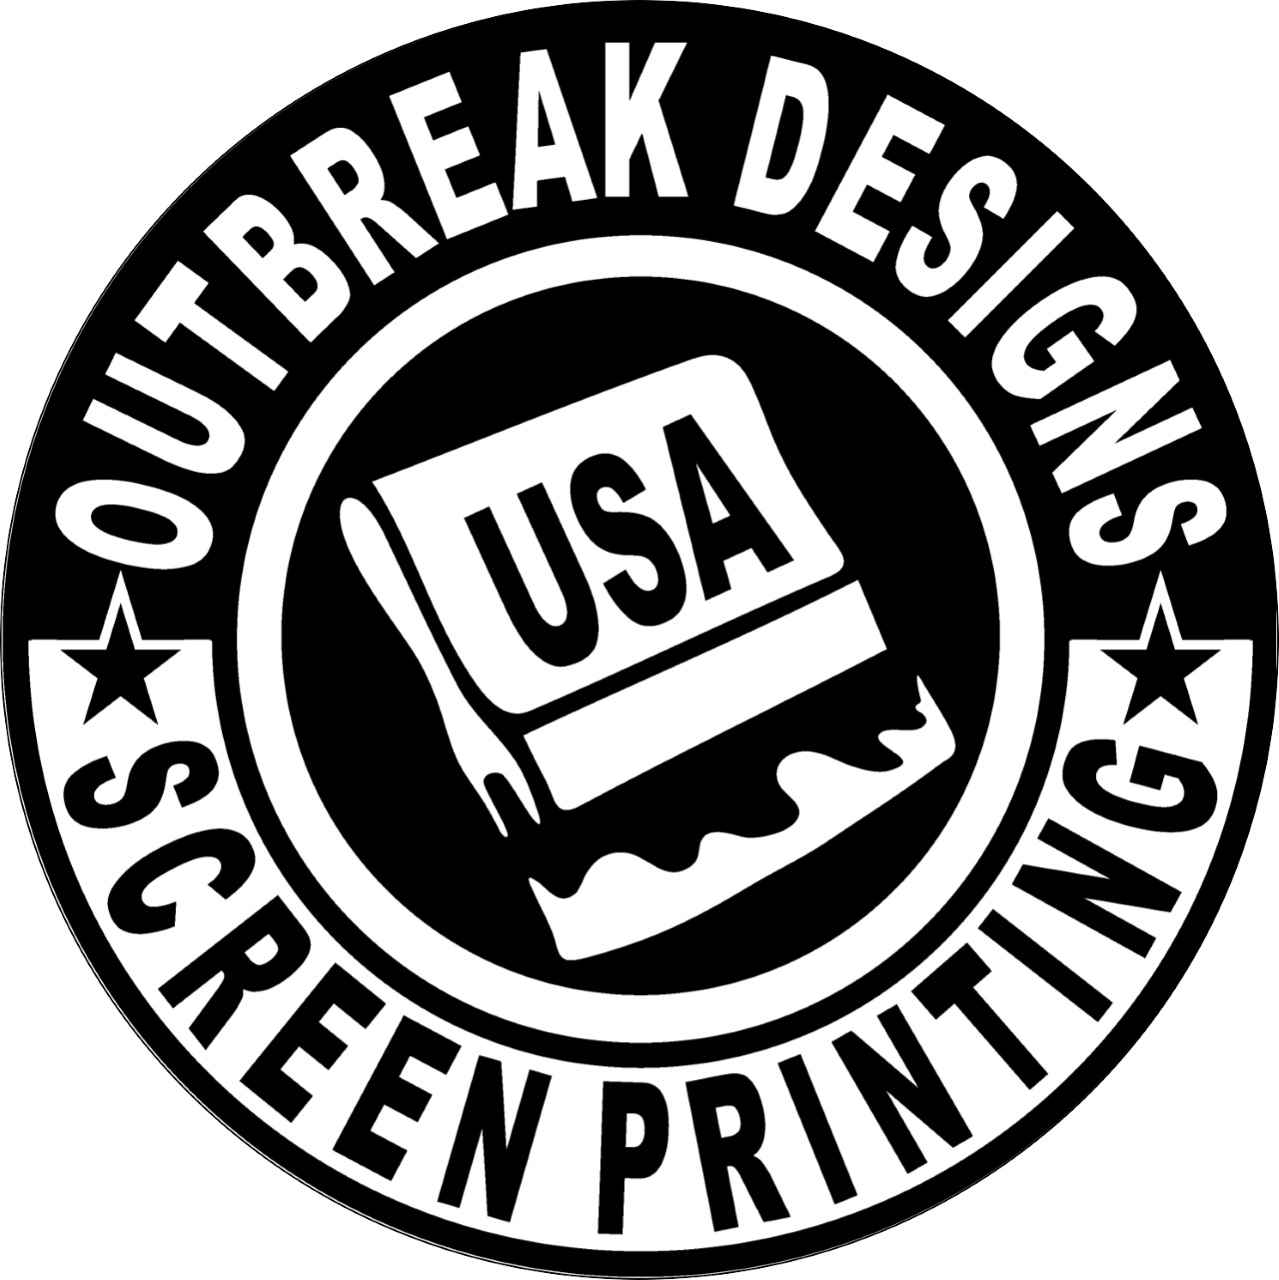 Outbreak designs